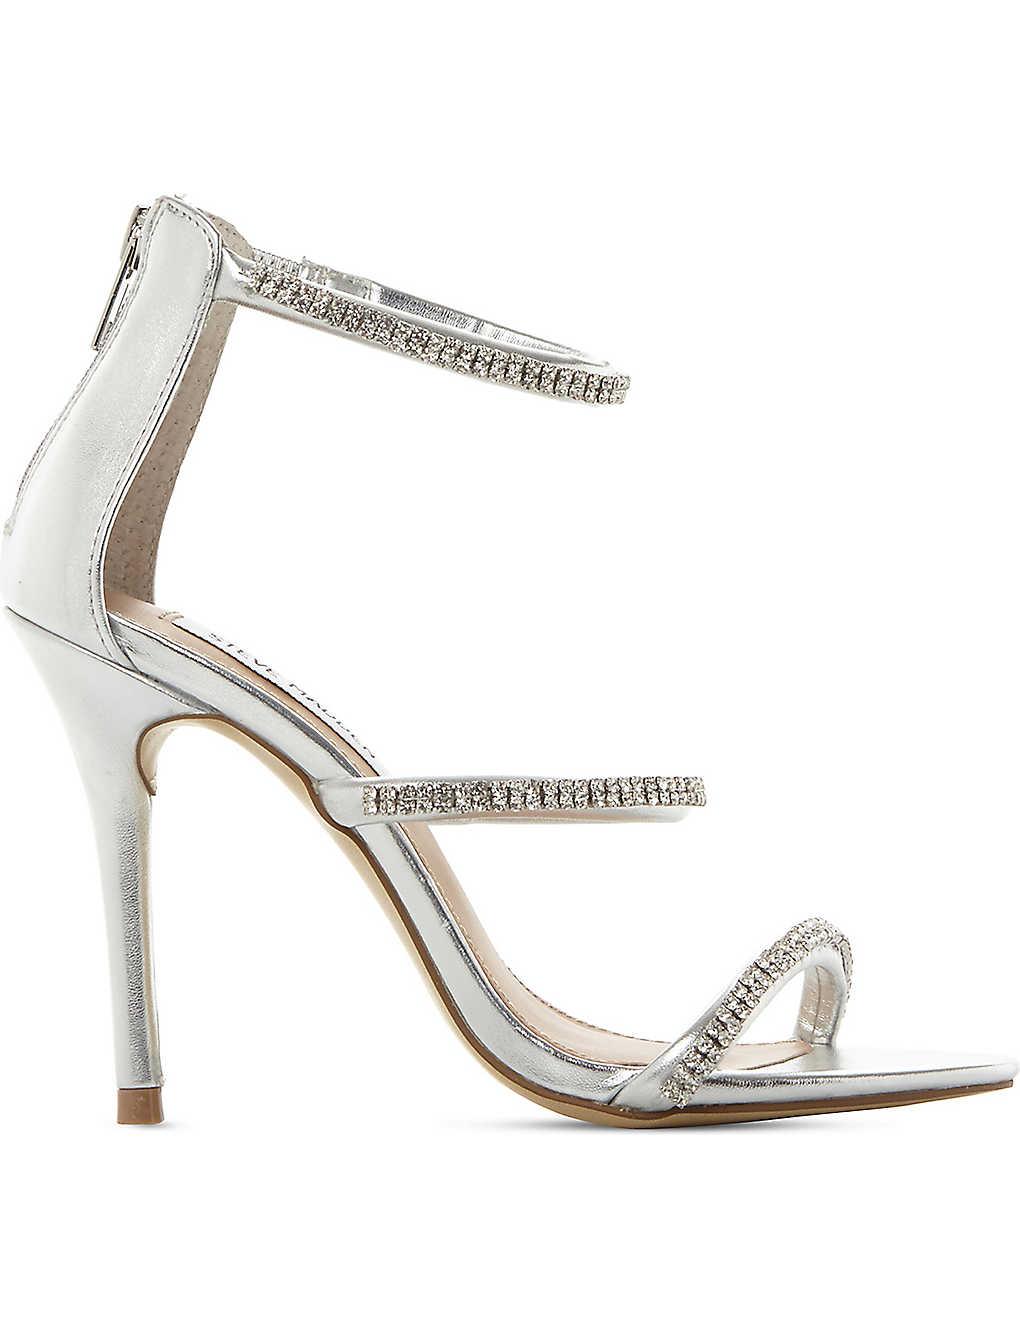 276d554b216 STEVE MADDEN - Wren-R metallic strappy sandals